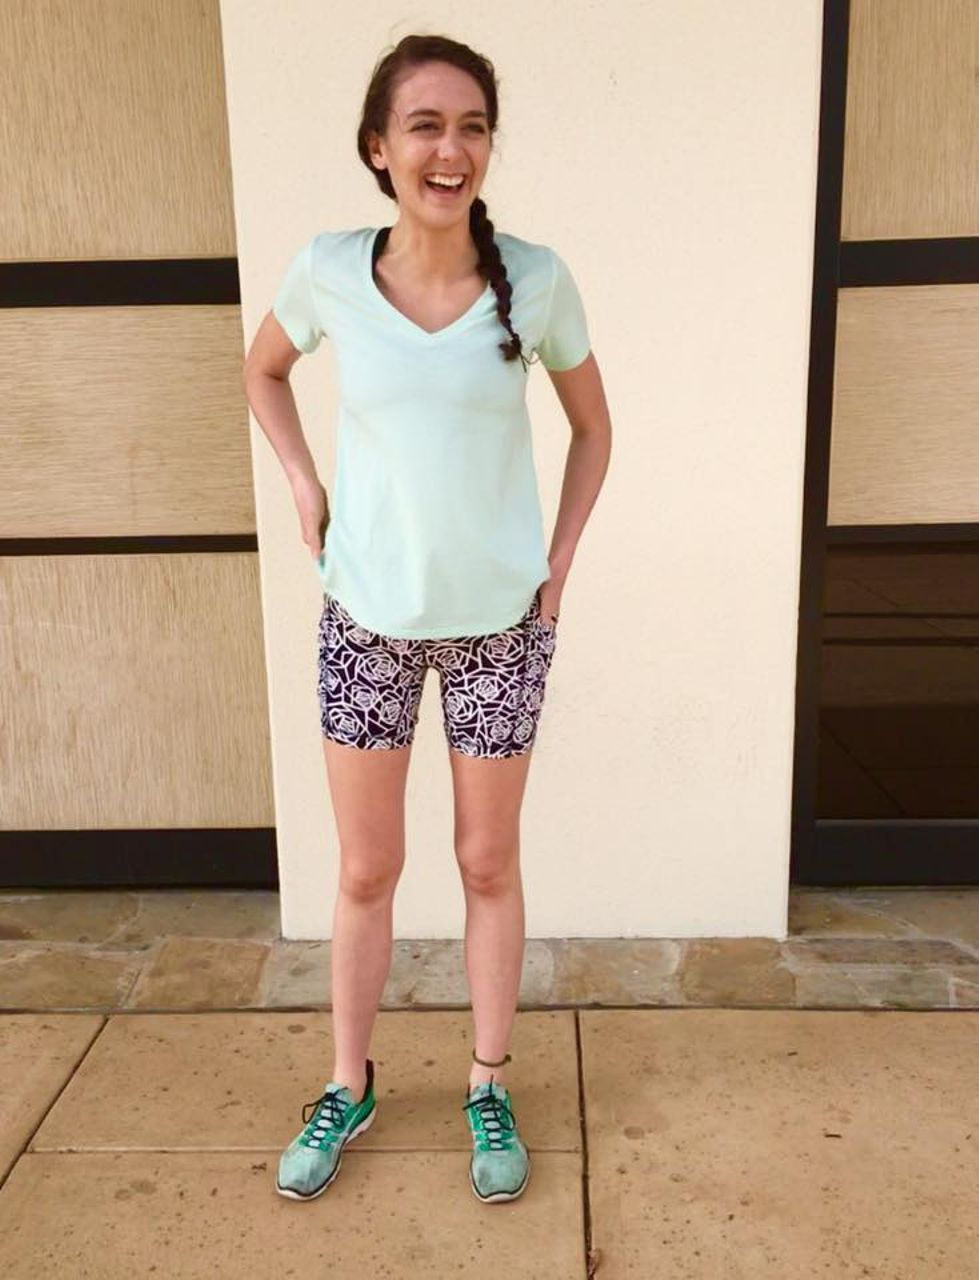 Lululemon Speed Track Short - Posey Black White / Miss Mosaic White